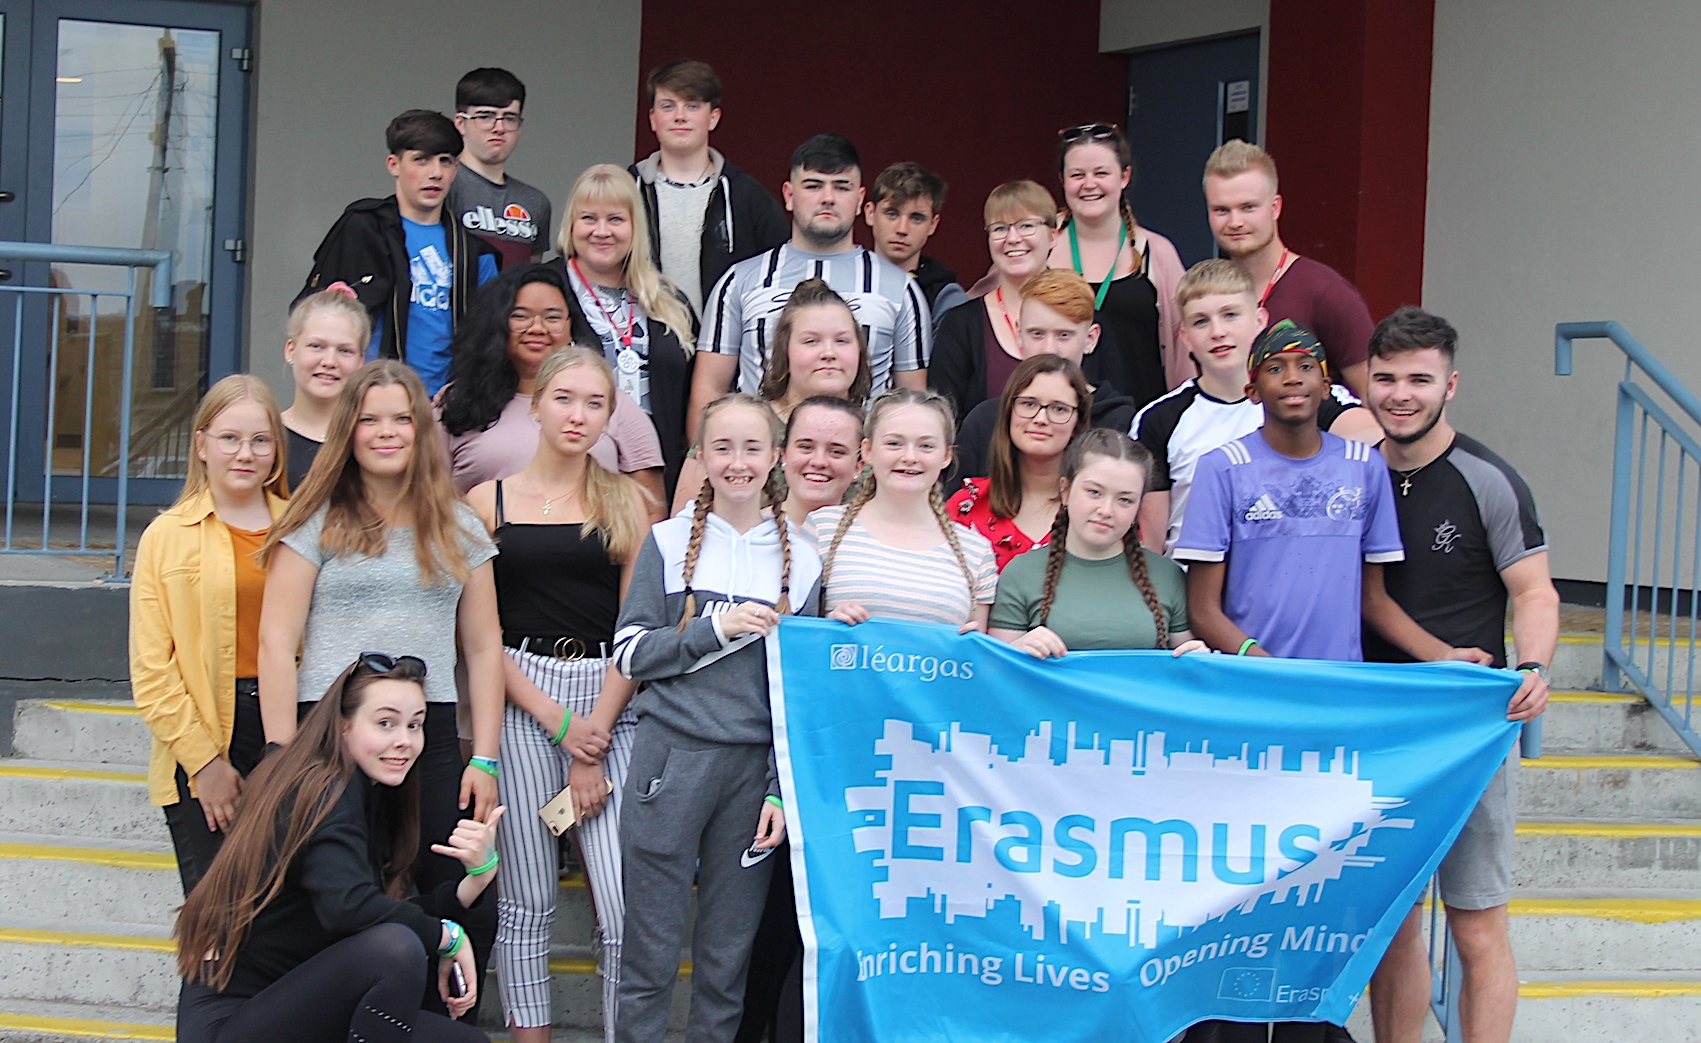 Limerick Youth Service Finnish